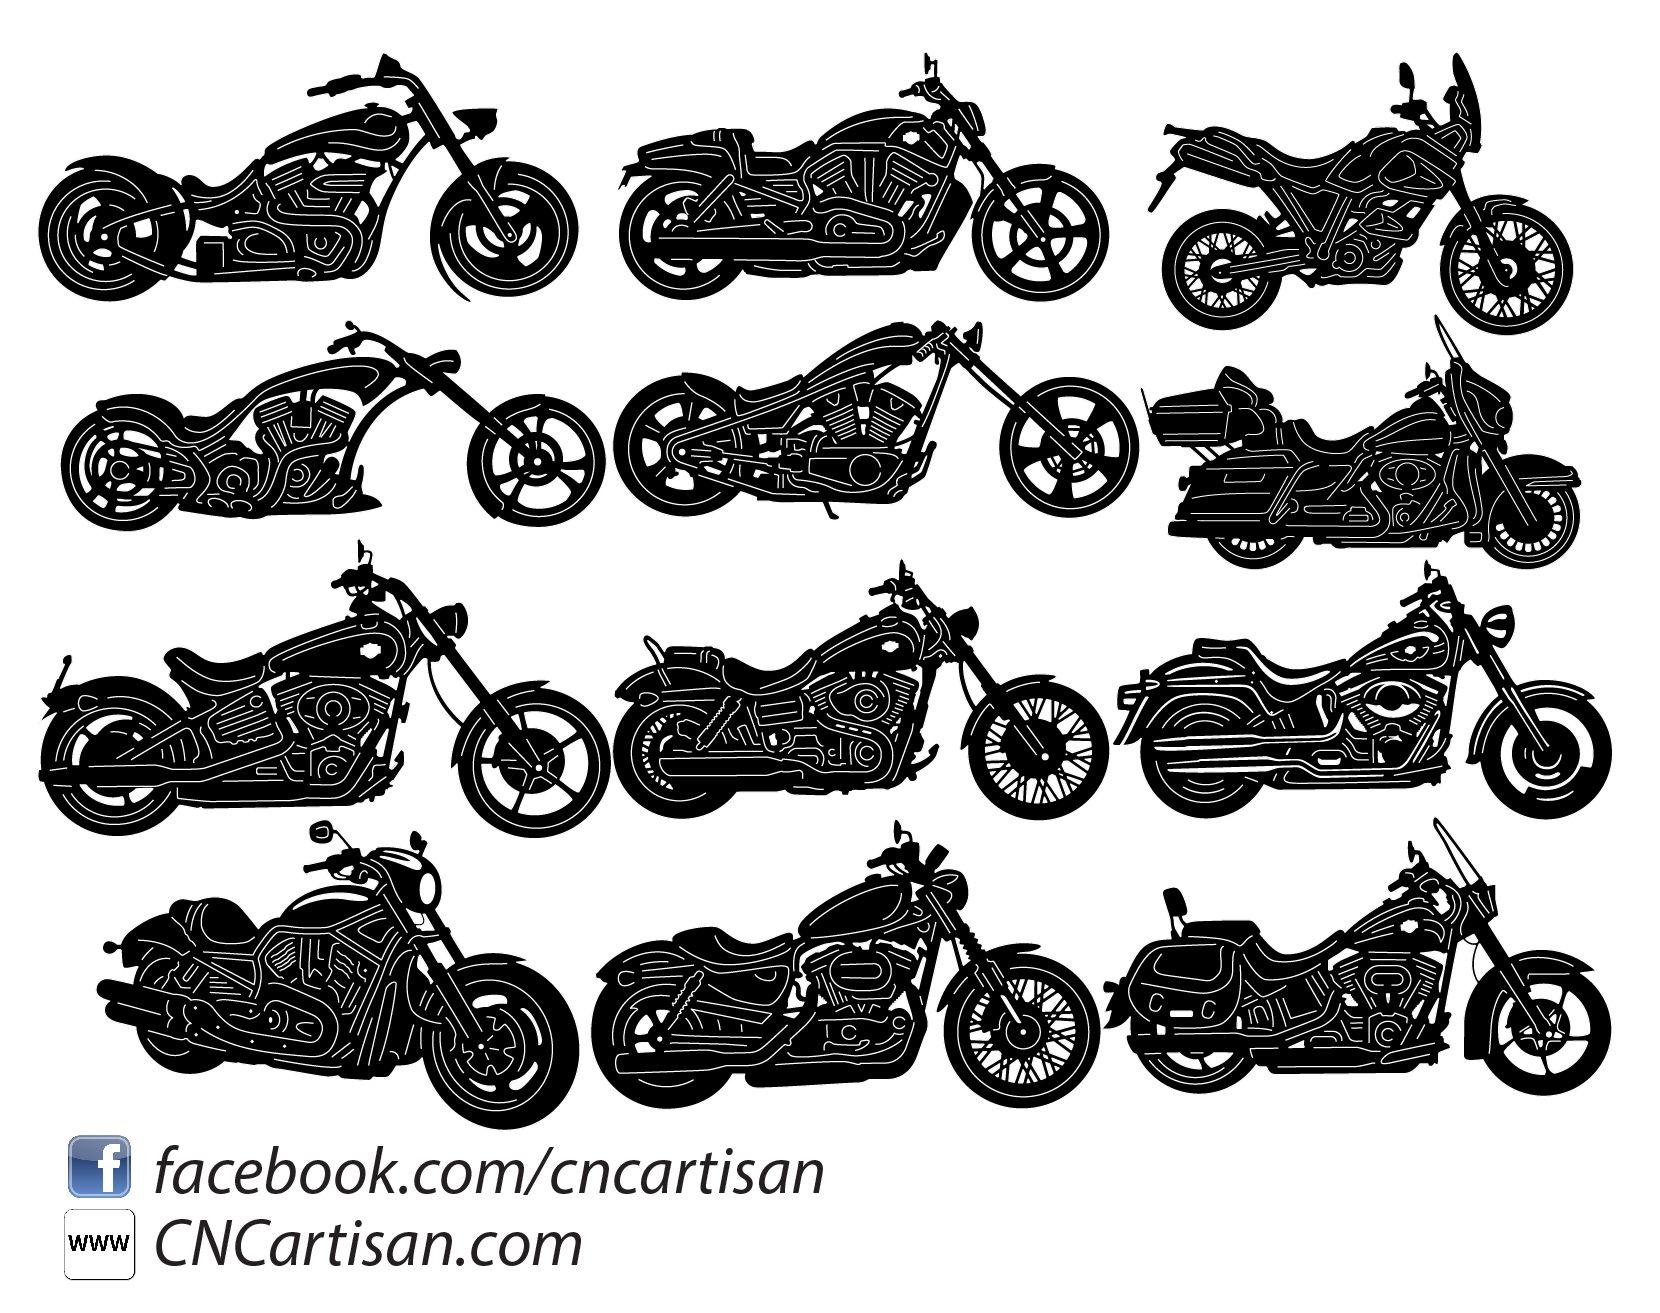 Motorcycle And Chopper Bike